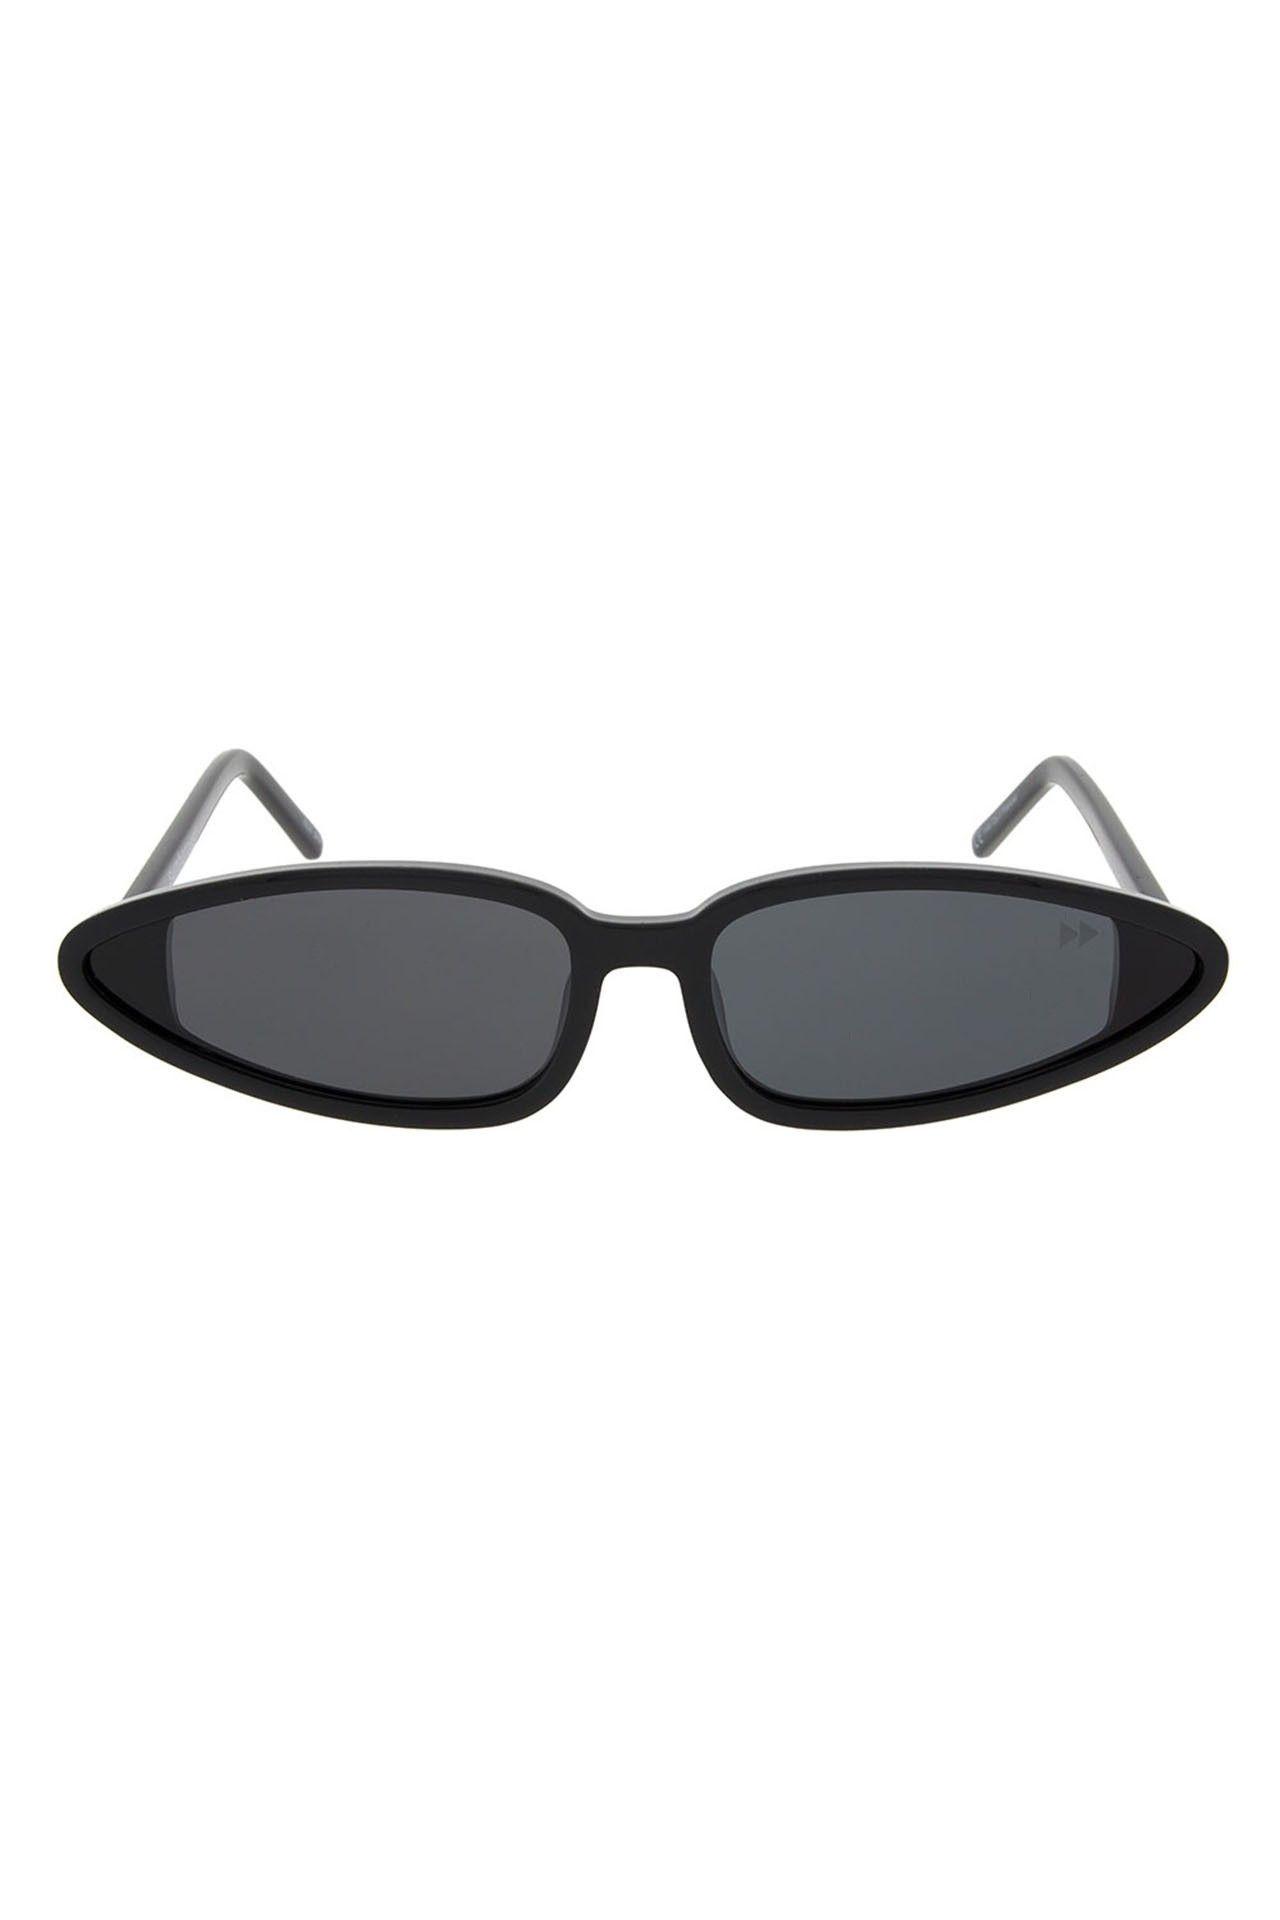 Afbeelding van Sunheroes Ima Premium 6230 Zonnebril Black